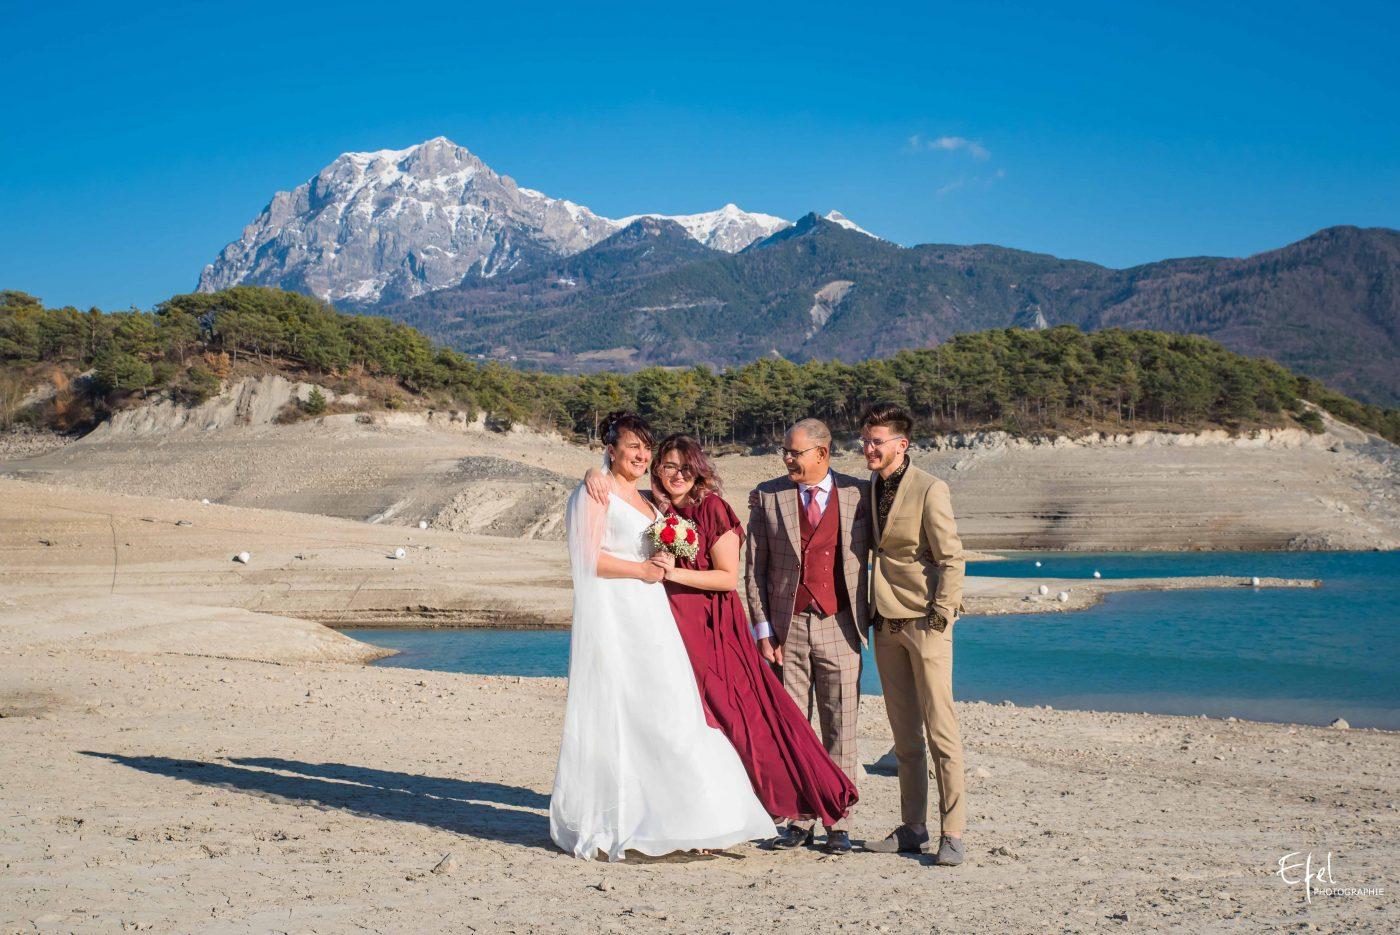 shooting famille mariage en montagne photographe gap